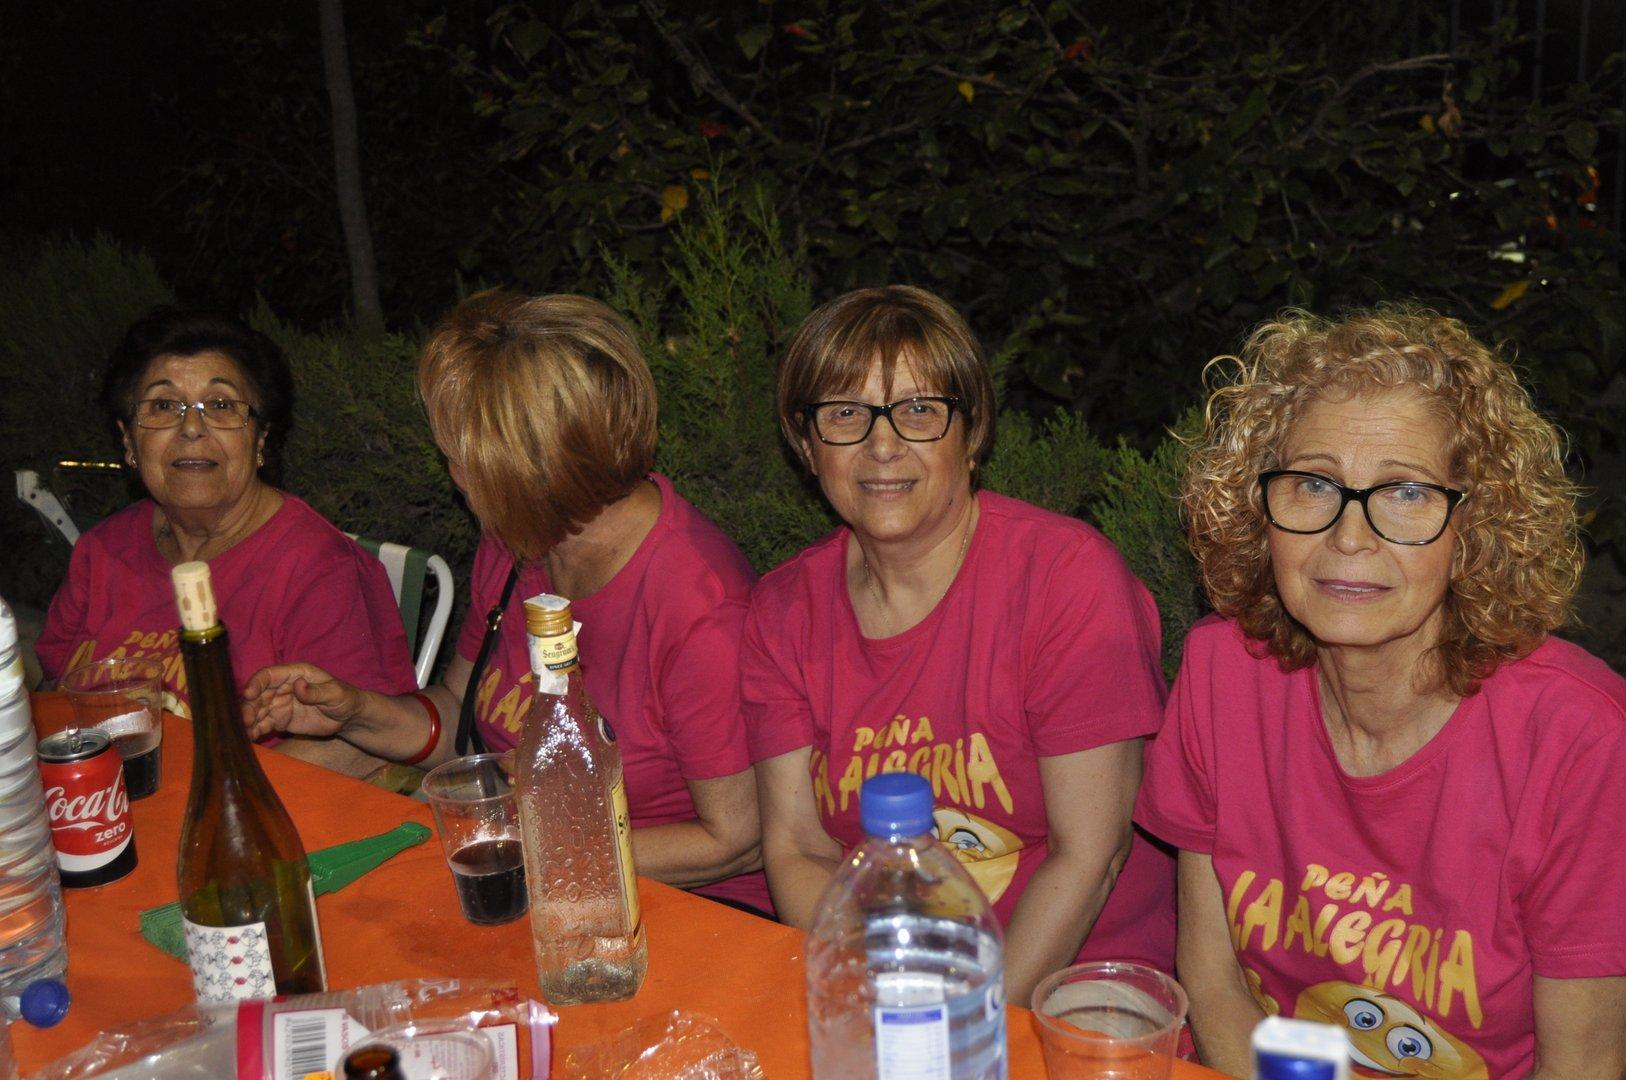 Gachasmigas Fiestas Archena 2017